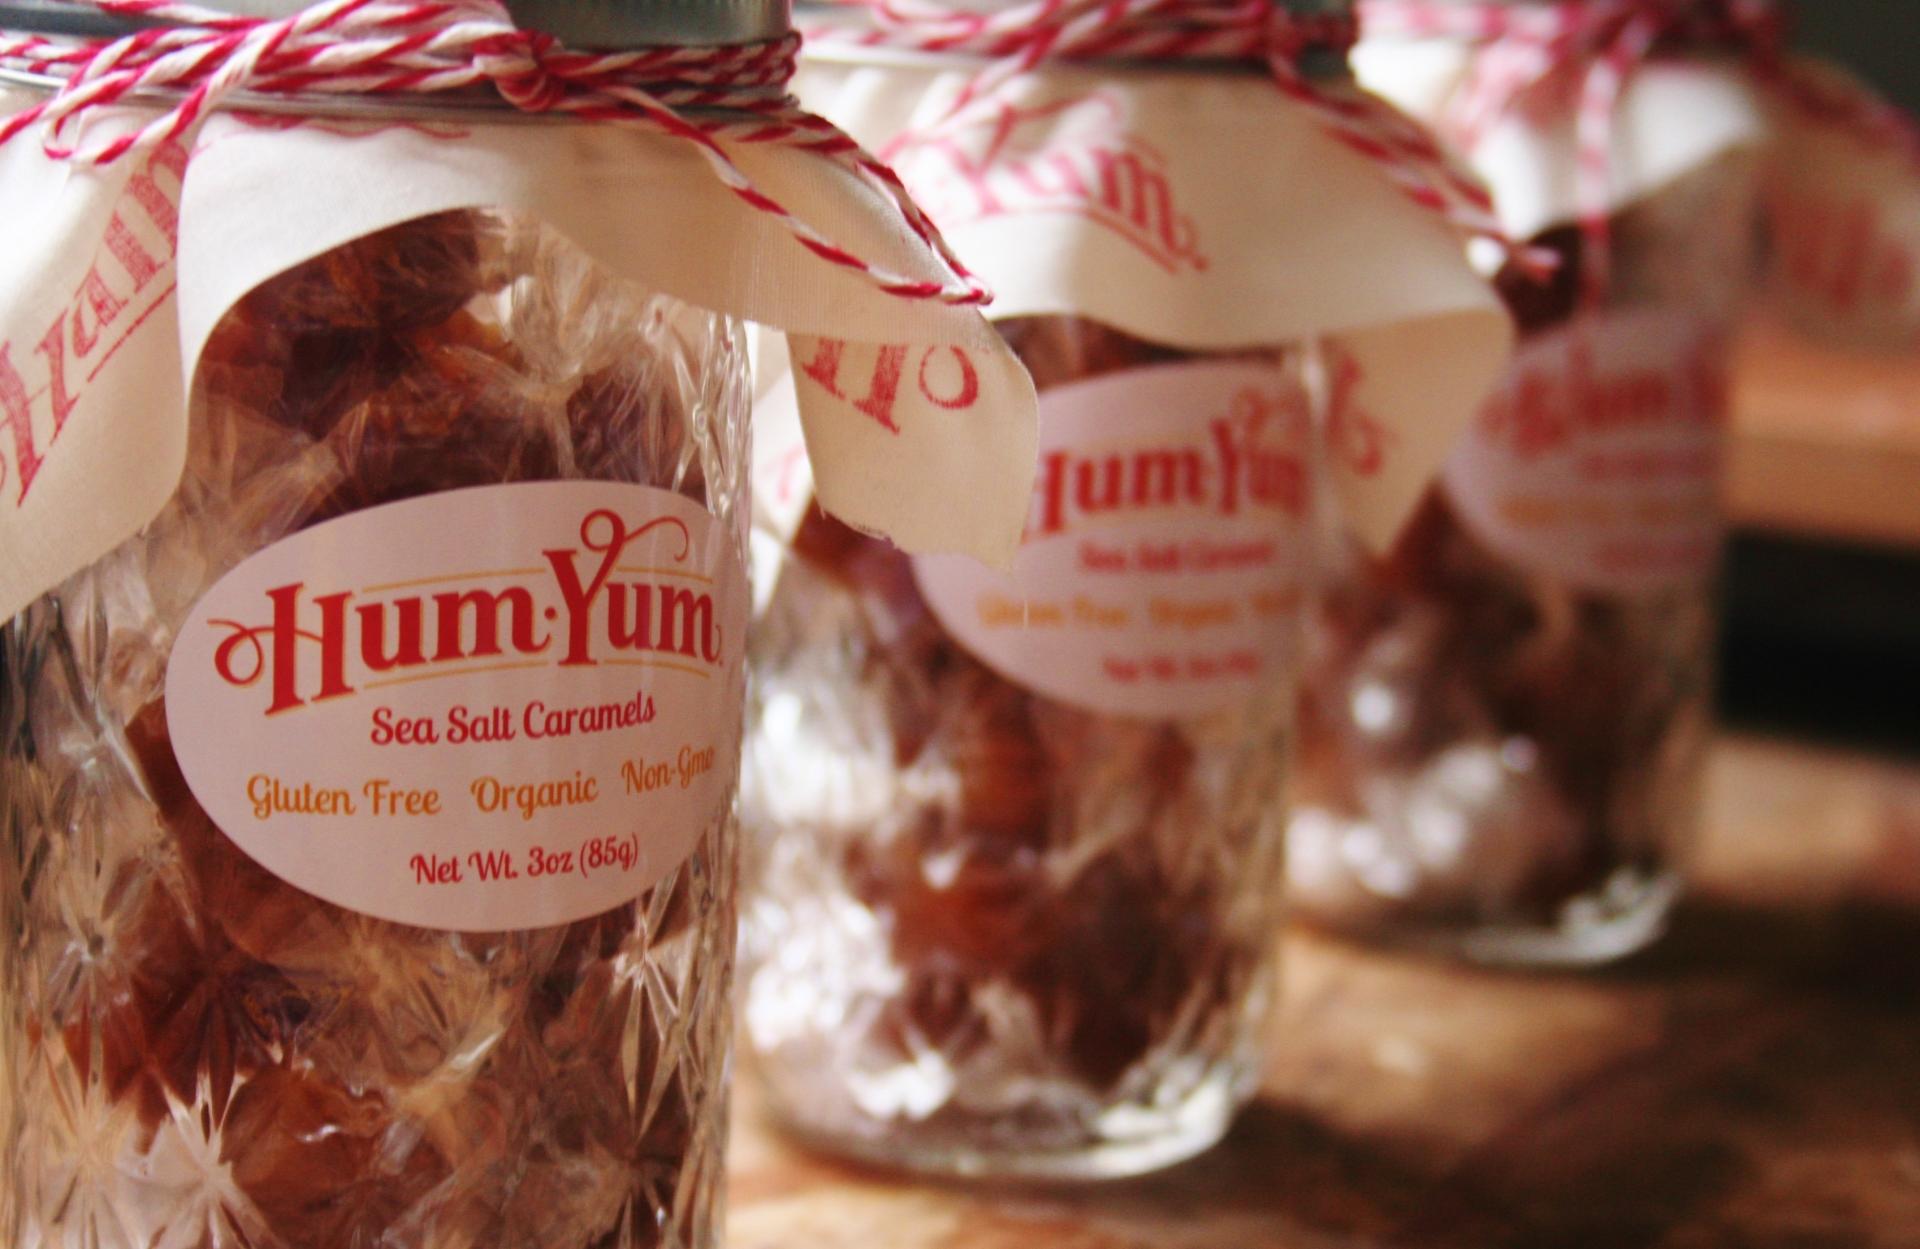 HumYum Gluten Free Candy